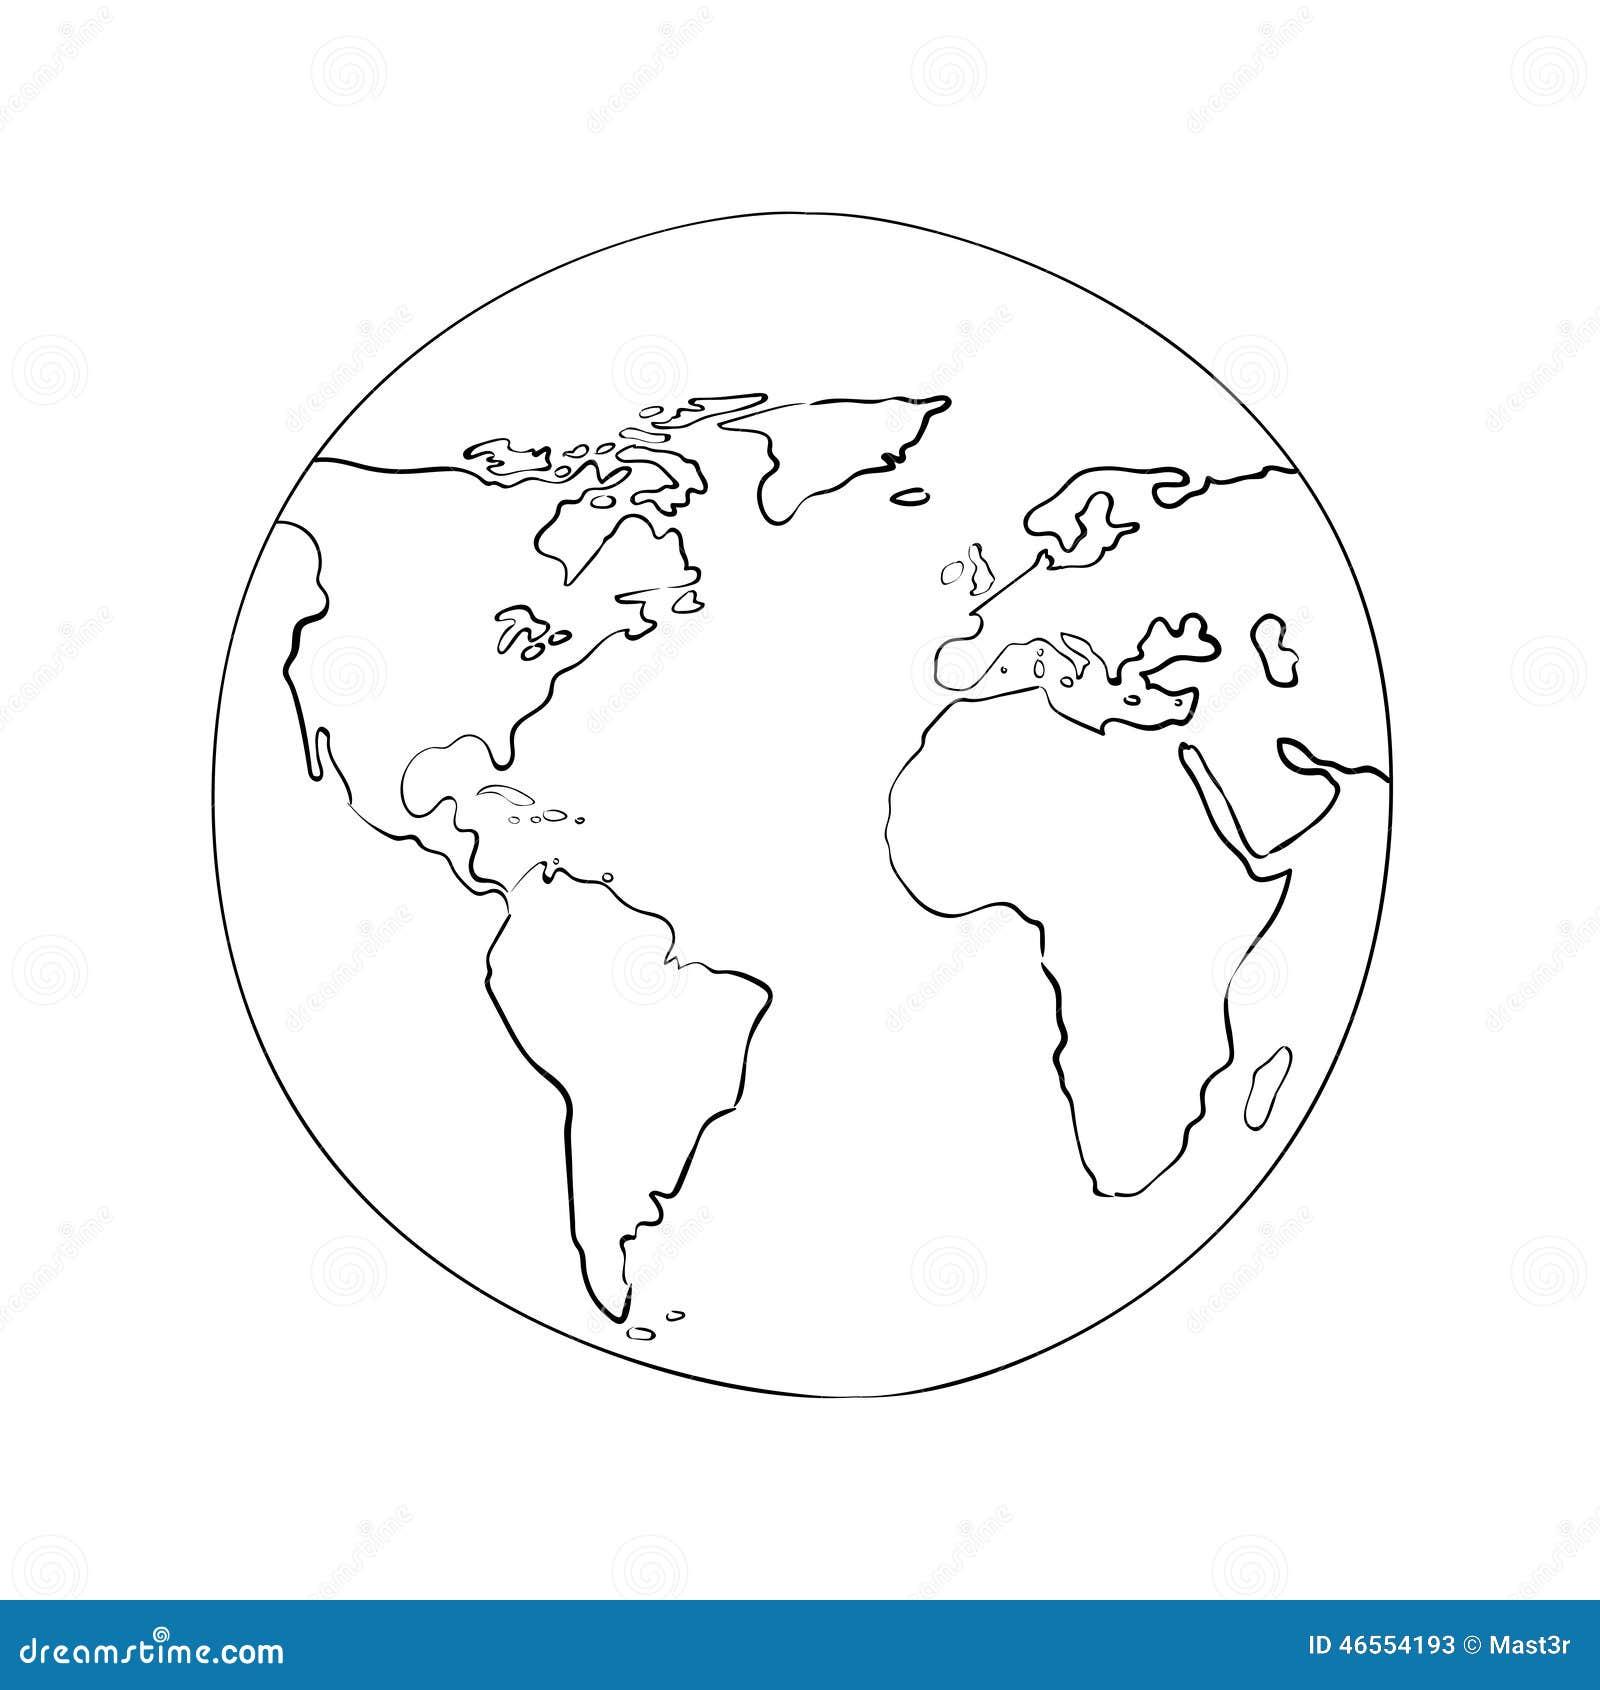 World map outline black and white vatozozdevelopment world publicscrutiny Gallery